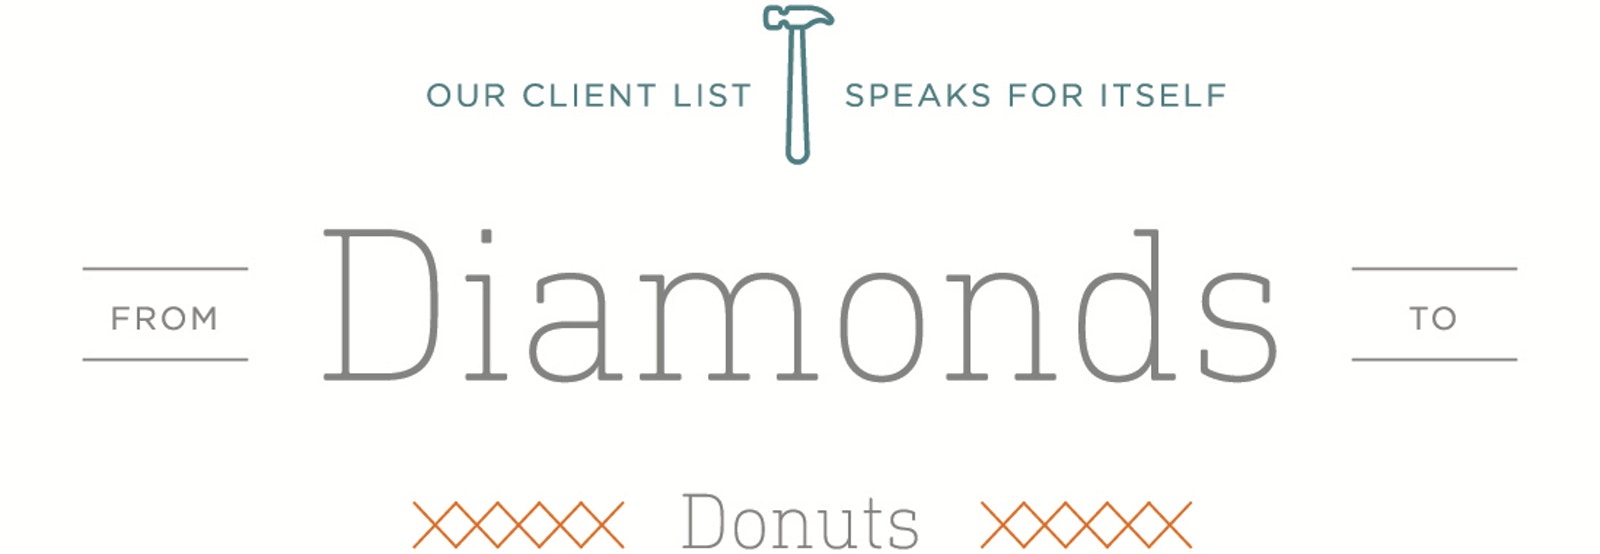 client header logo